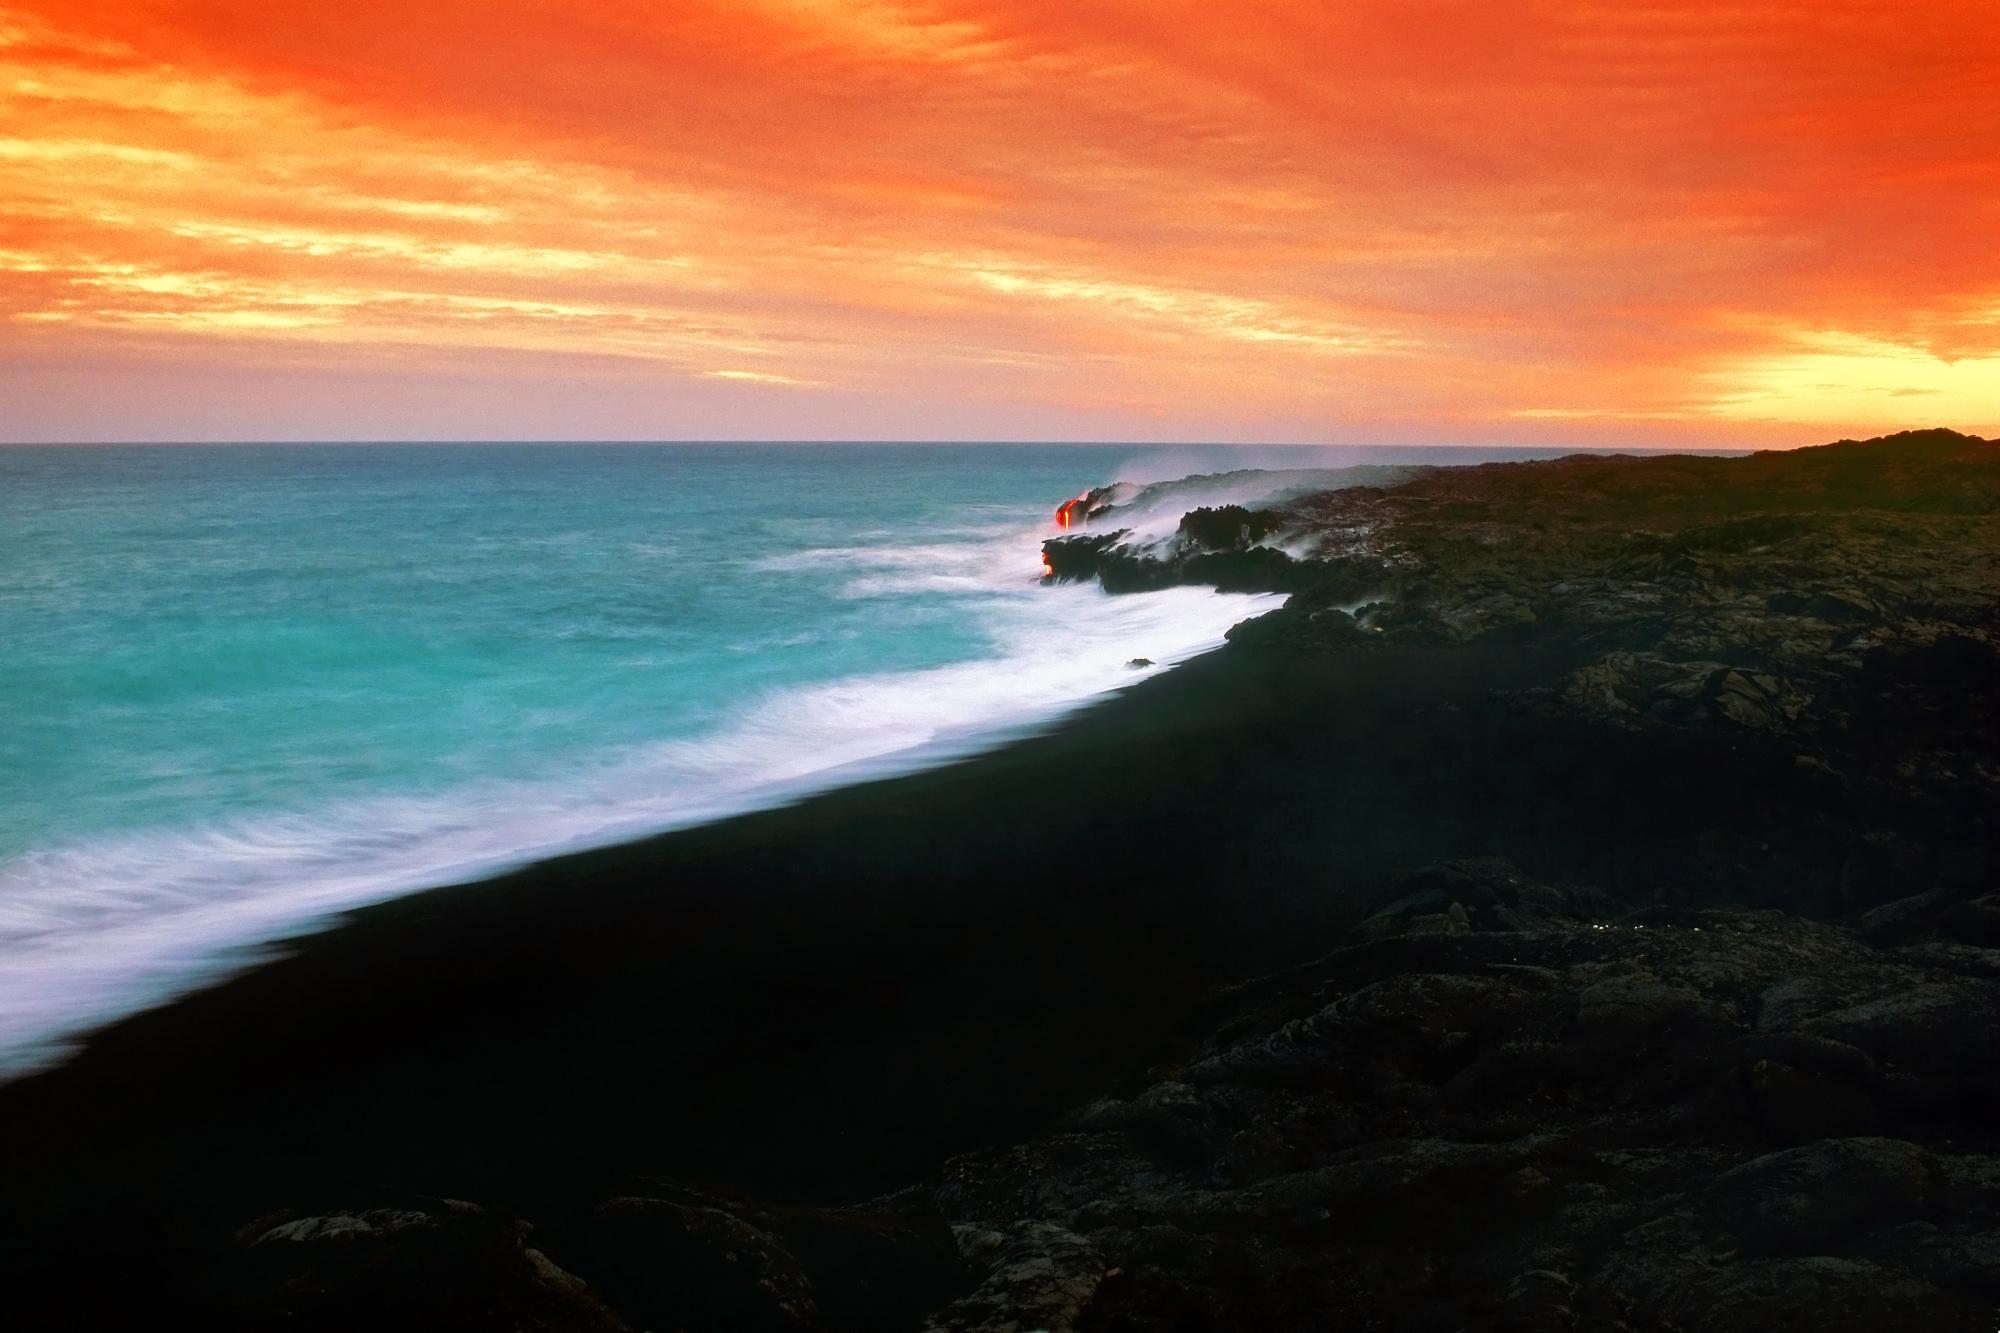 Sunset over a lava fields in Hawaii wallpaper - Beach Wallpapers